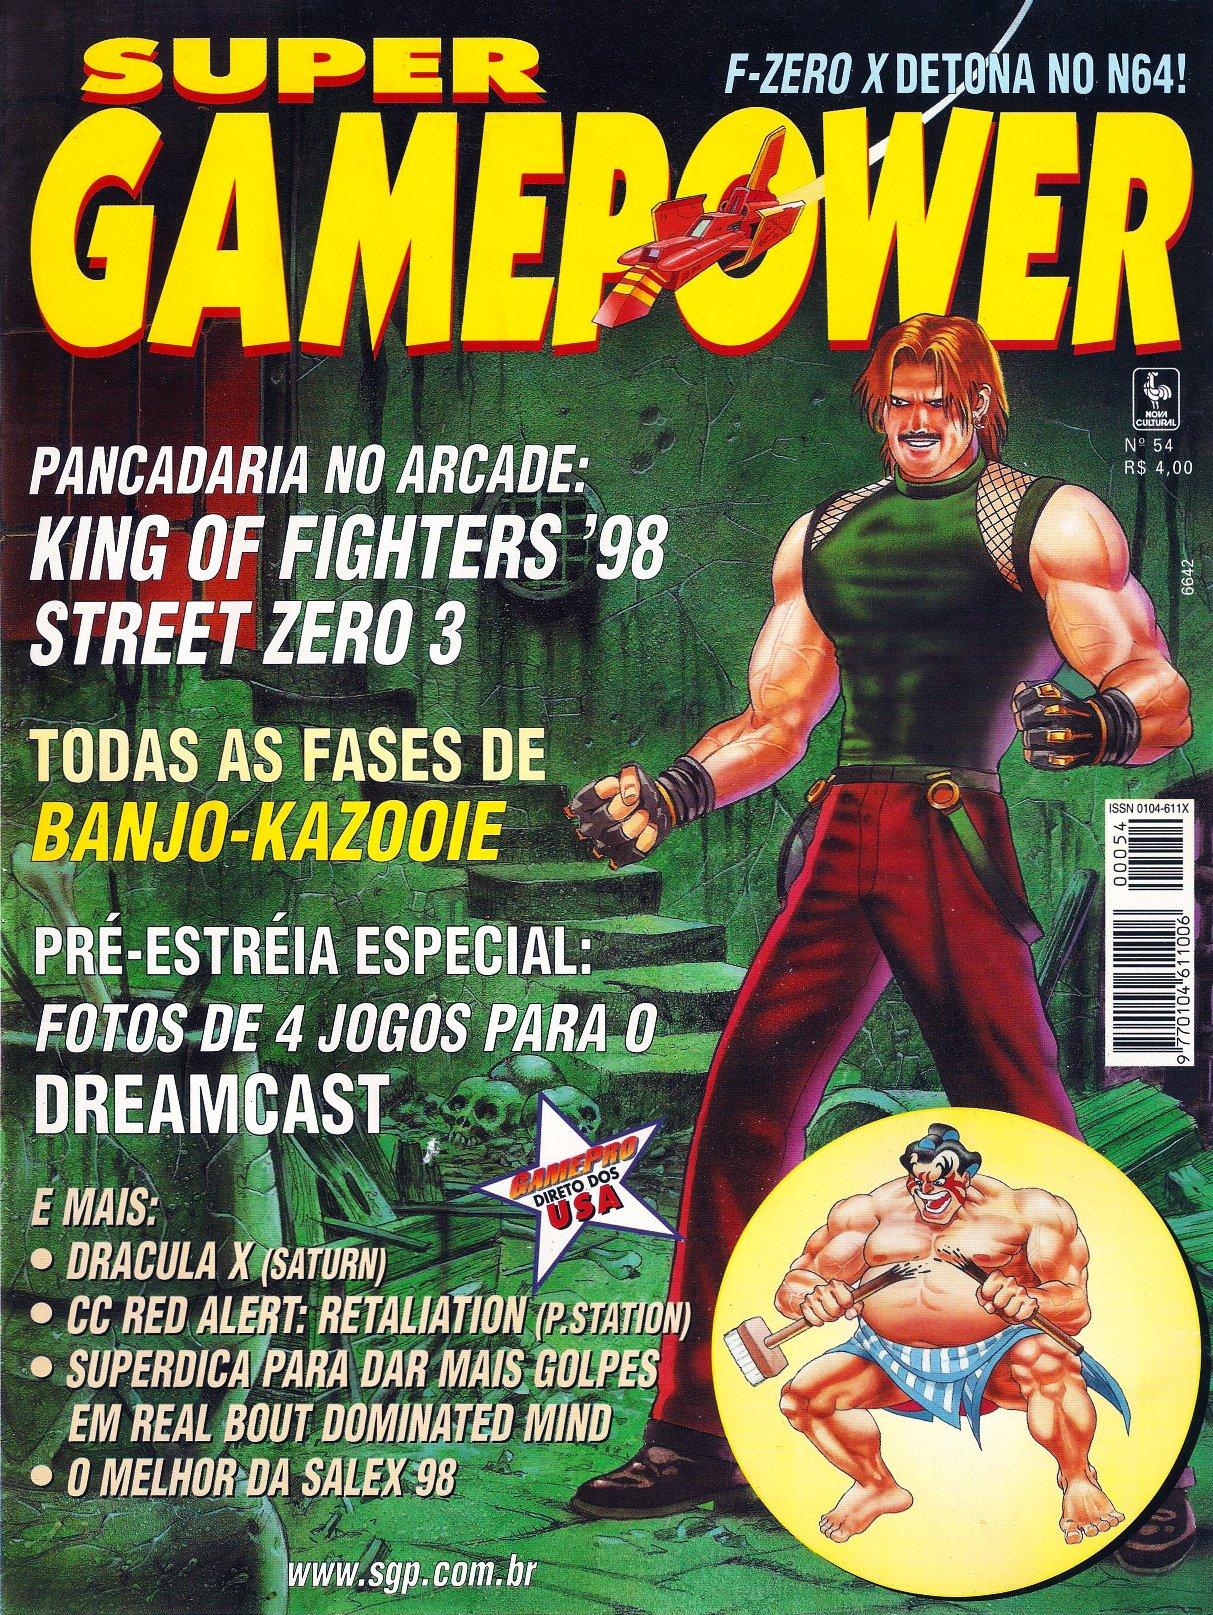 SuperGamePower Issue 054 (September 1998)